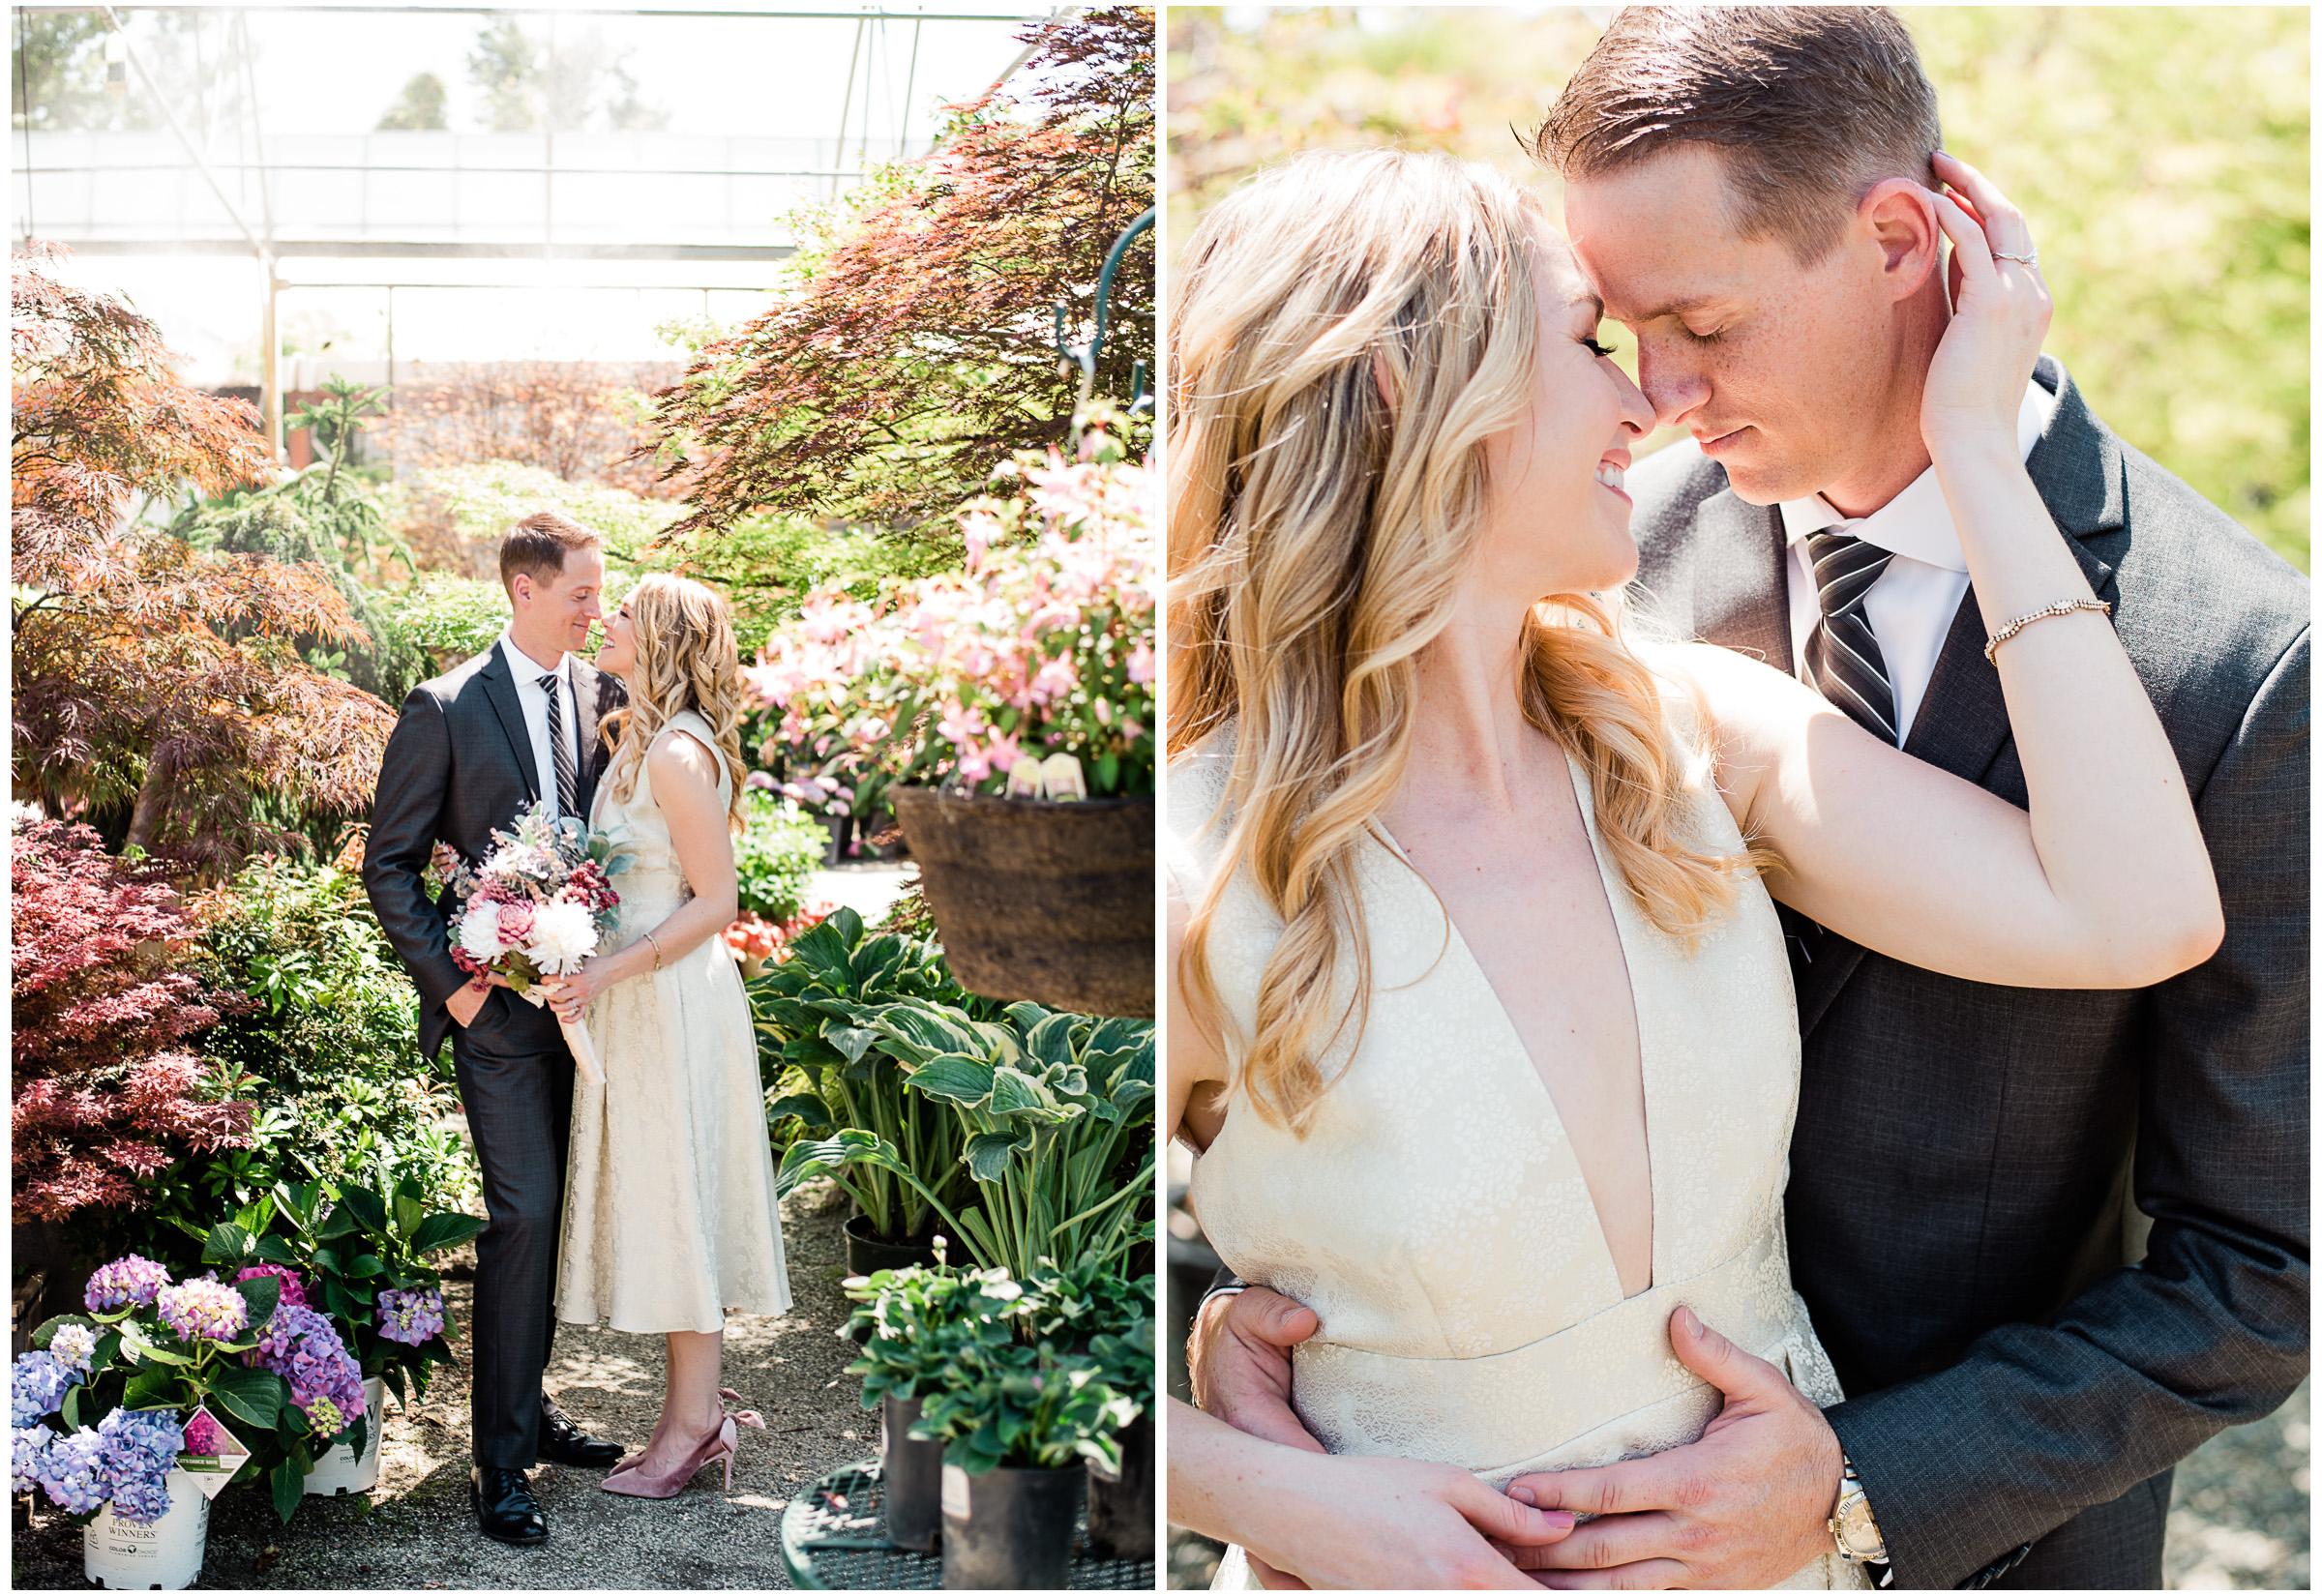 Loomis Wedding - Sacramento Photographer - Blue Goose - Justin Wilcox Photography - 10.jpg